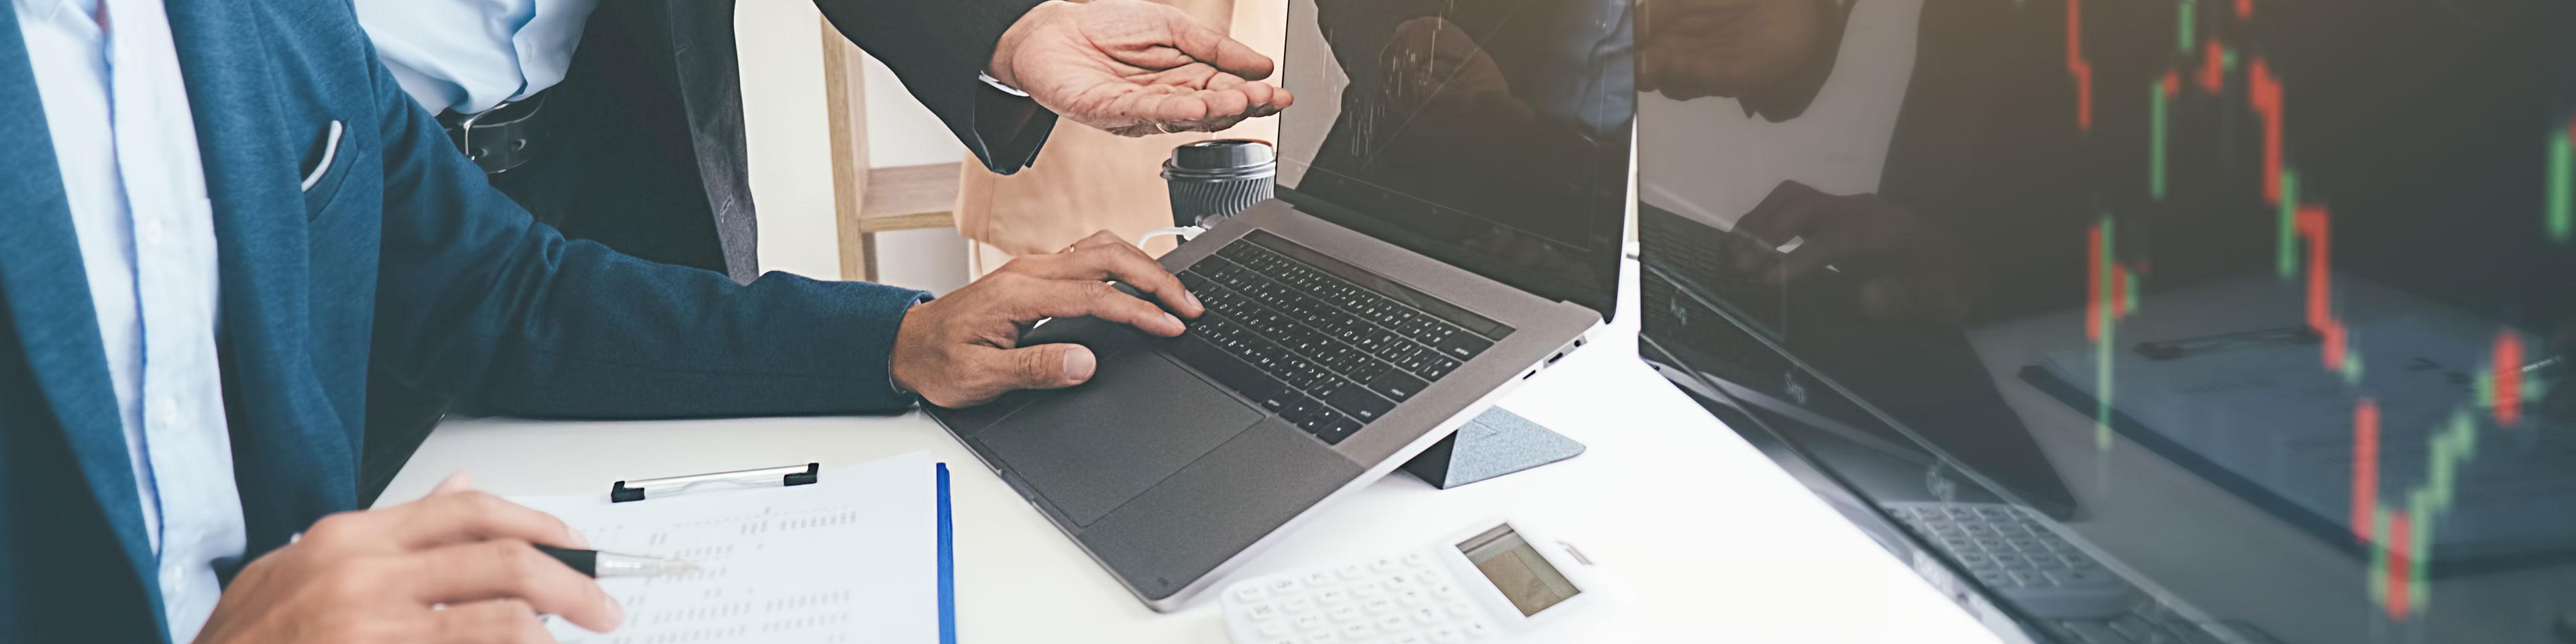 Enhancing Risk Assessments and Audit Planning